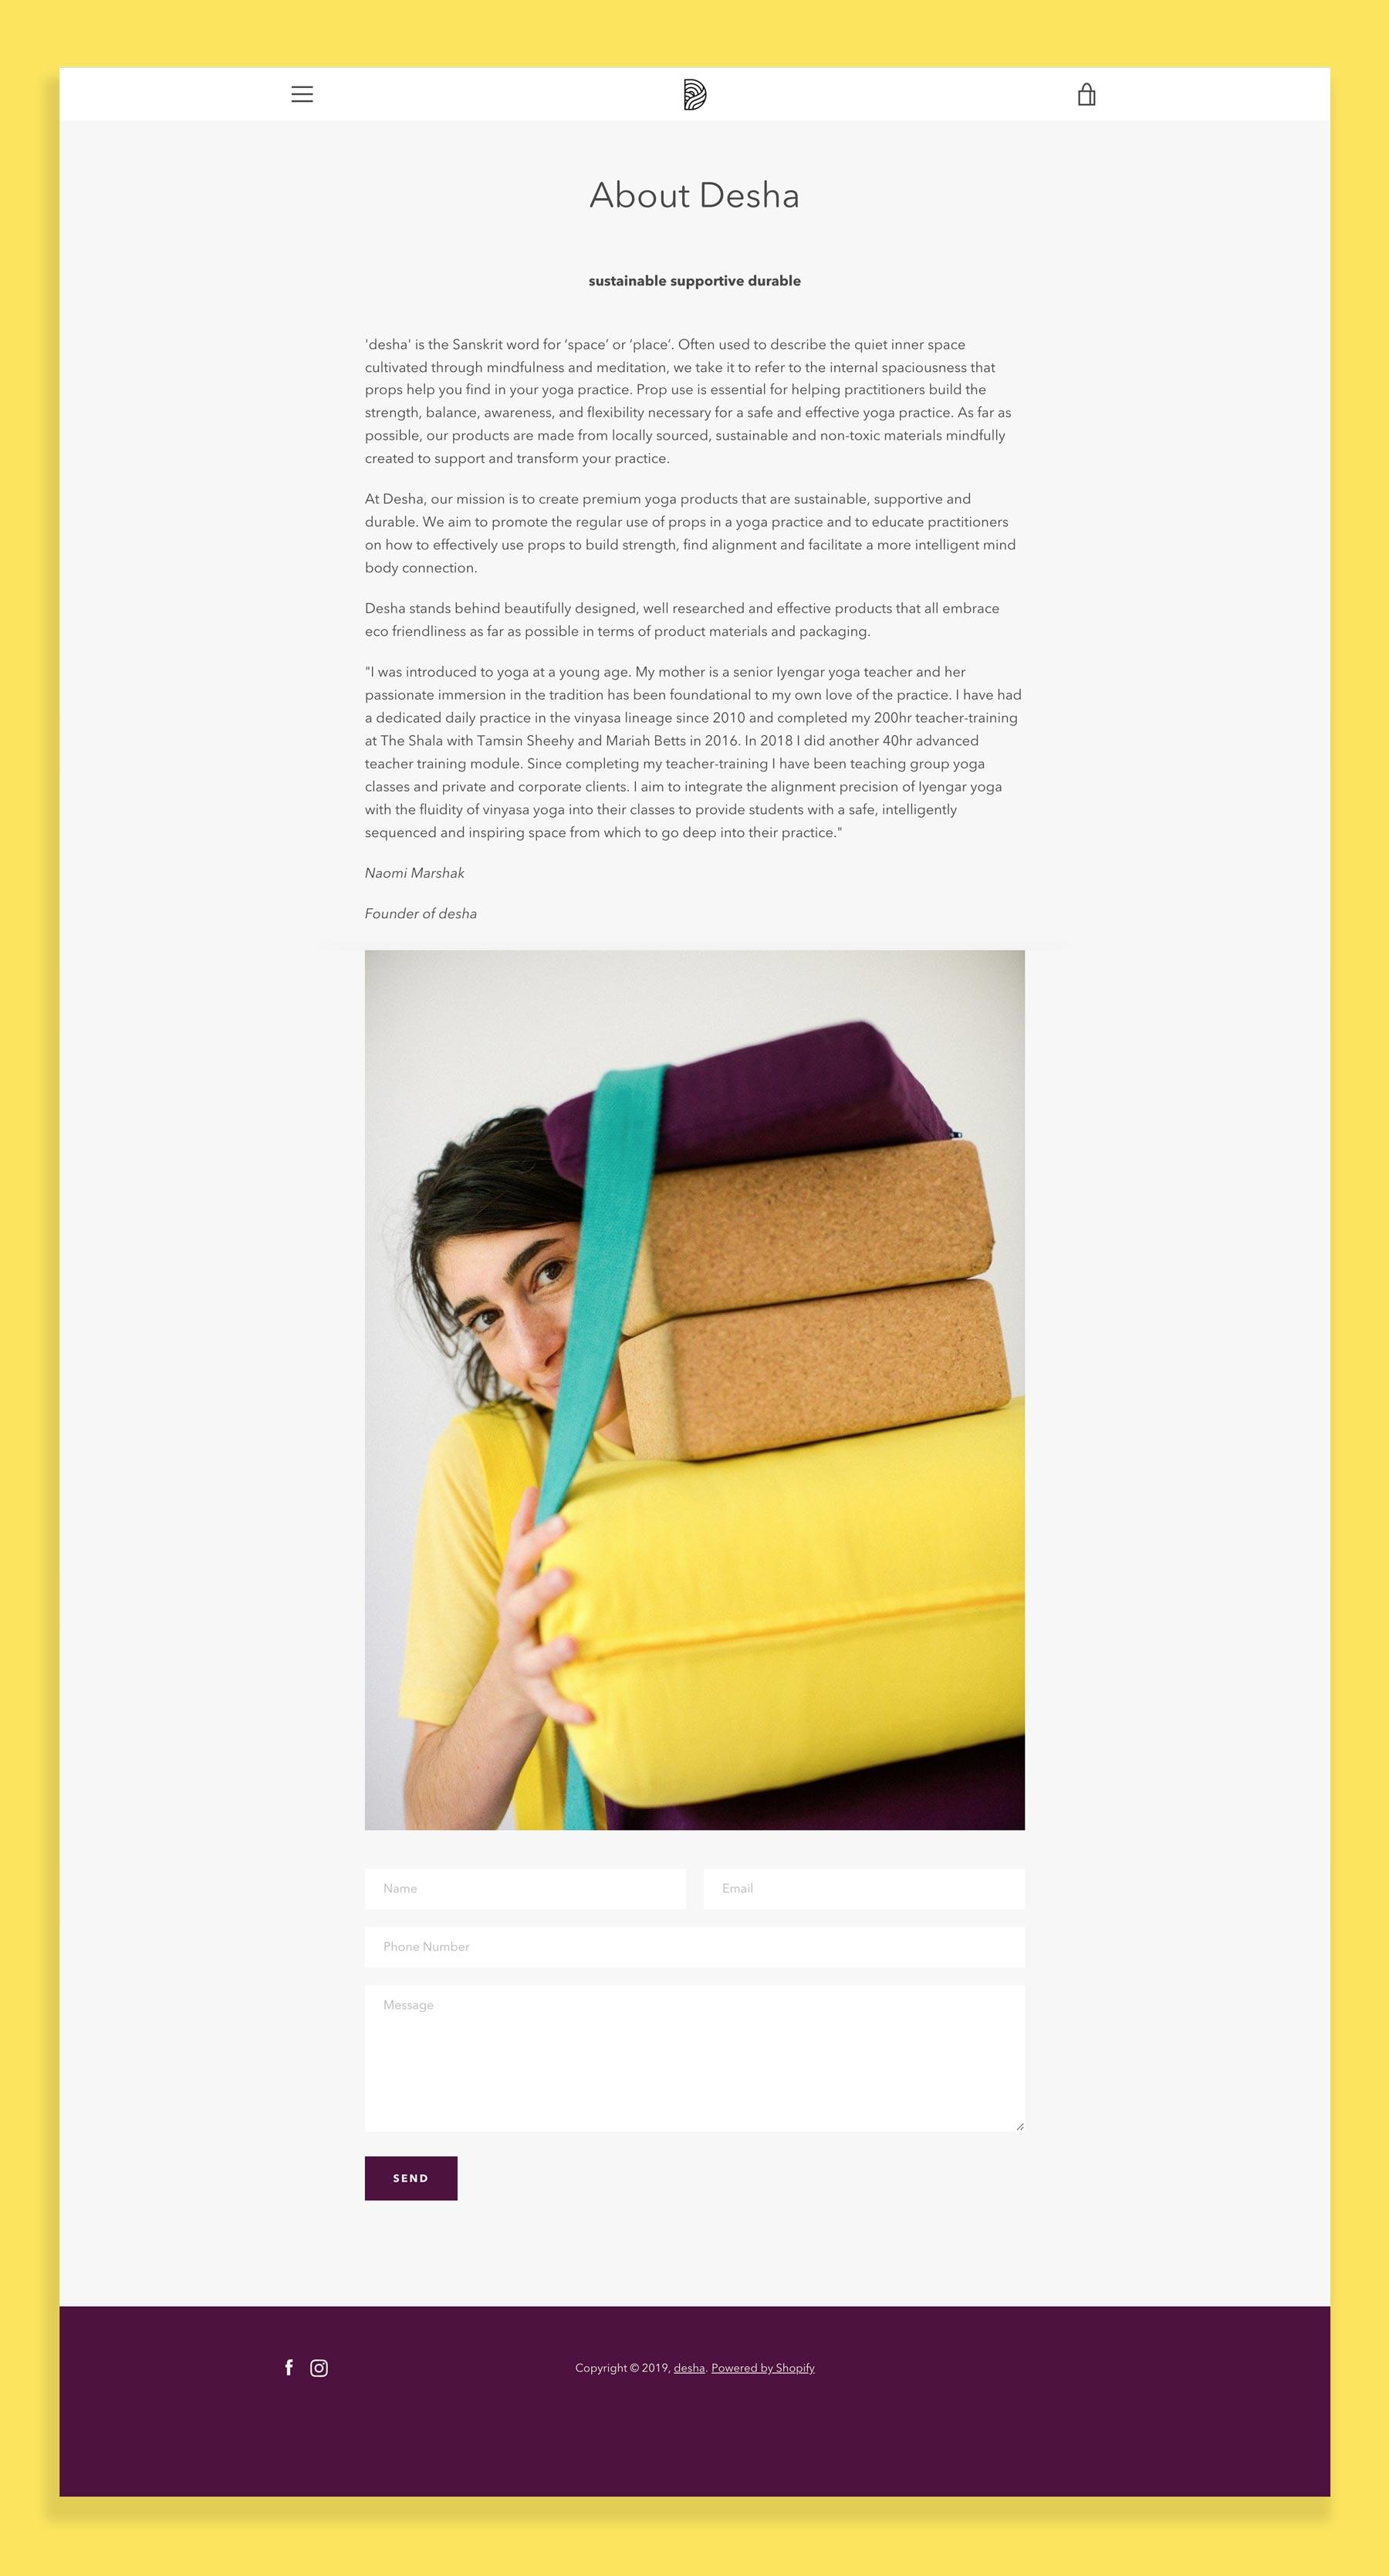 BorisHenry-Design-Brand-Agency-Cape-Town-Desha-3.jpg